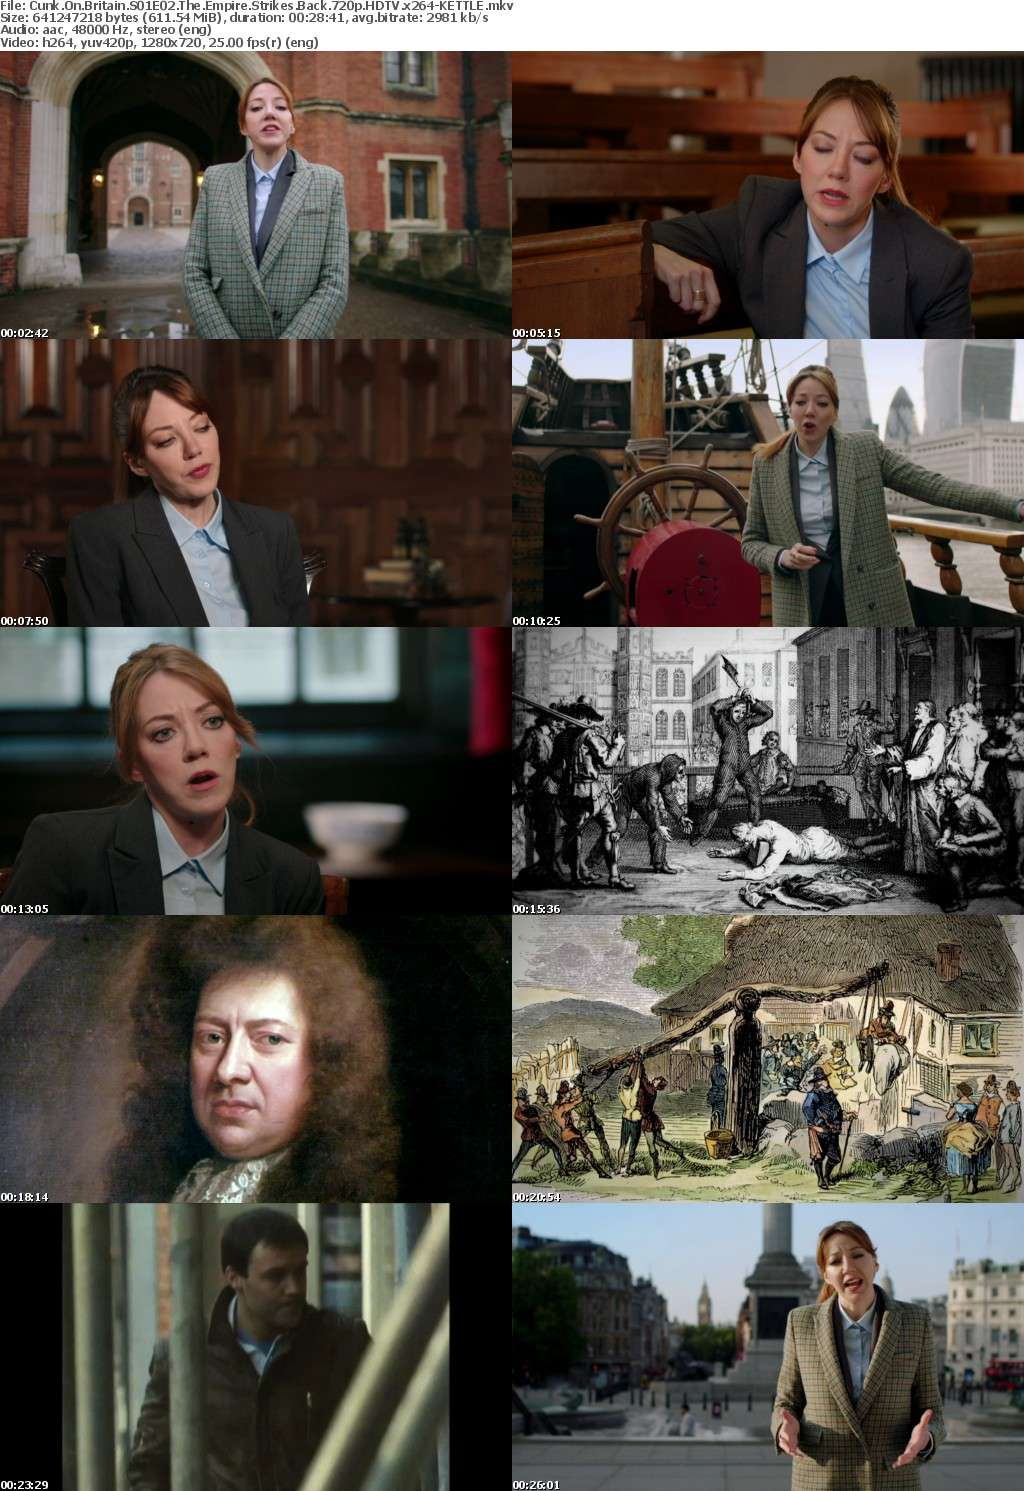 Cunk On Britain S01E02 The Empire Strikes Back 720p HDTV x264-KETTLE